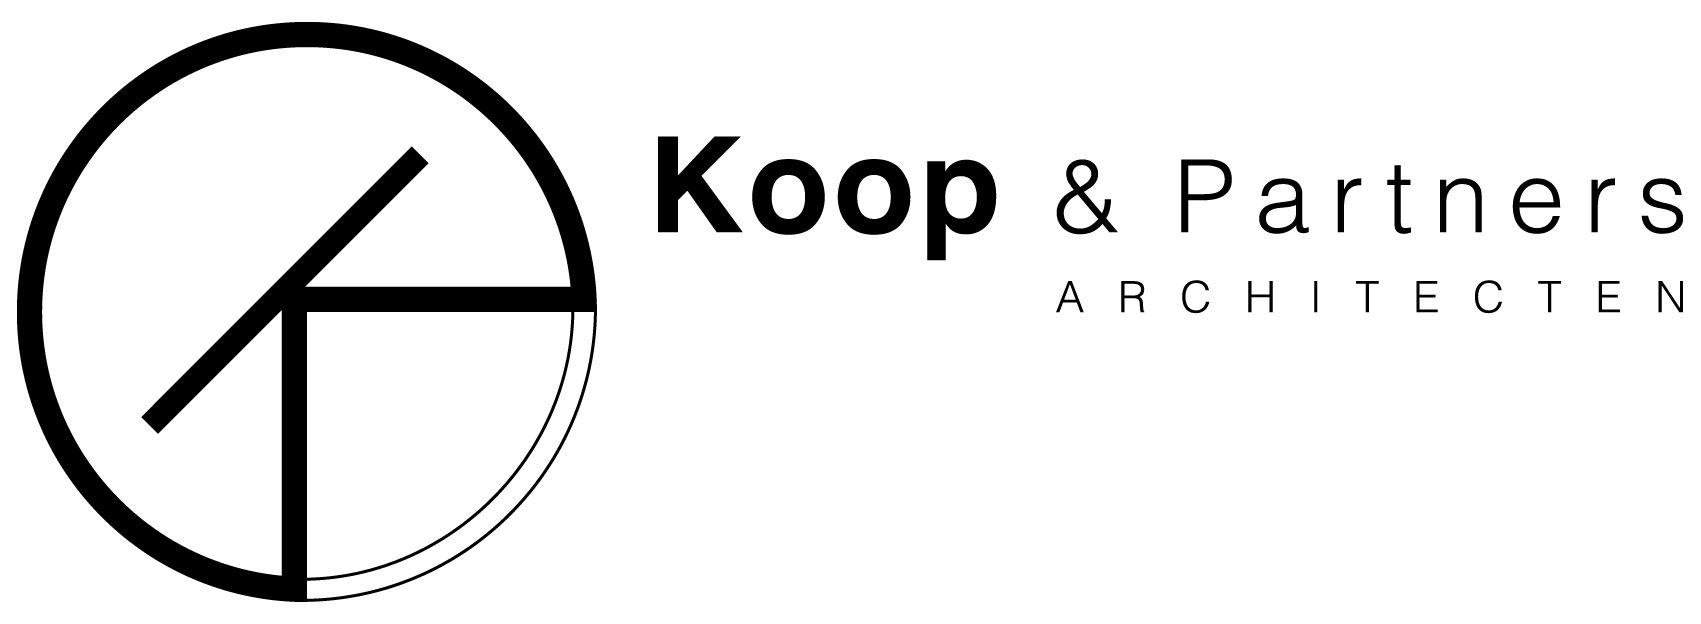 Dutch Architect - Huizen - Netherlands - #koopenpartners #architecture #architecturelovers #architectureporn #architecturephotograpy  #building #interiordesign #urban #deco #cities #street #bouw #town  #design #art #ontwerp #huizen #onsdarp #havenvanhuizen #tgooi #mooihuizen